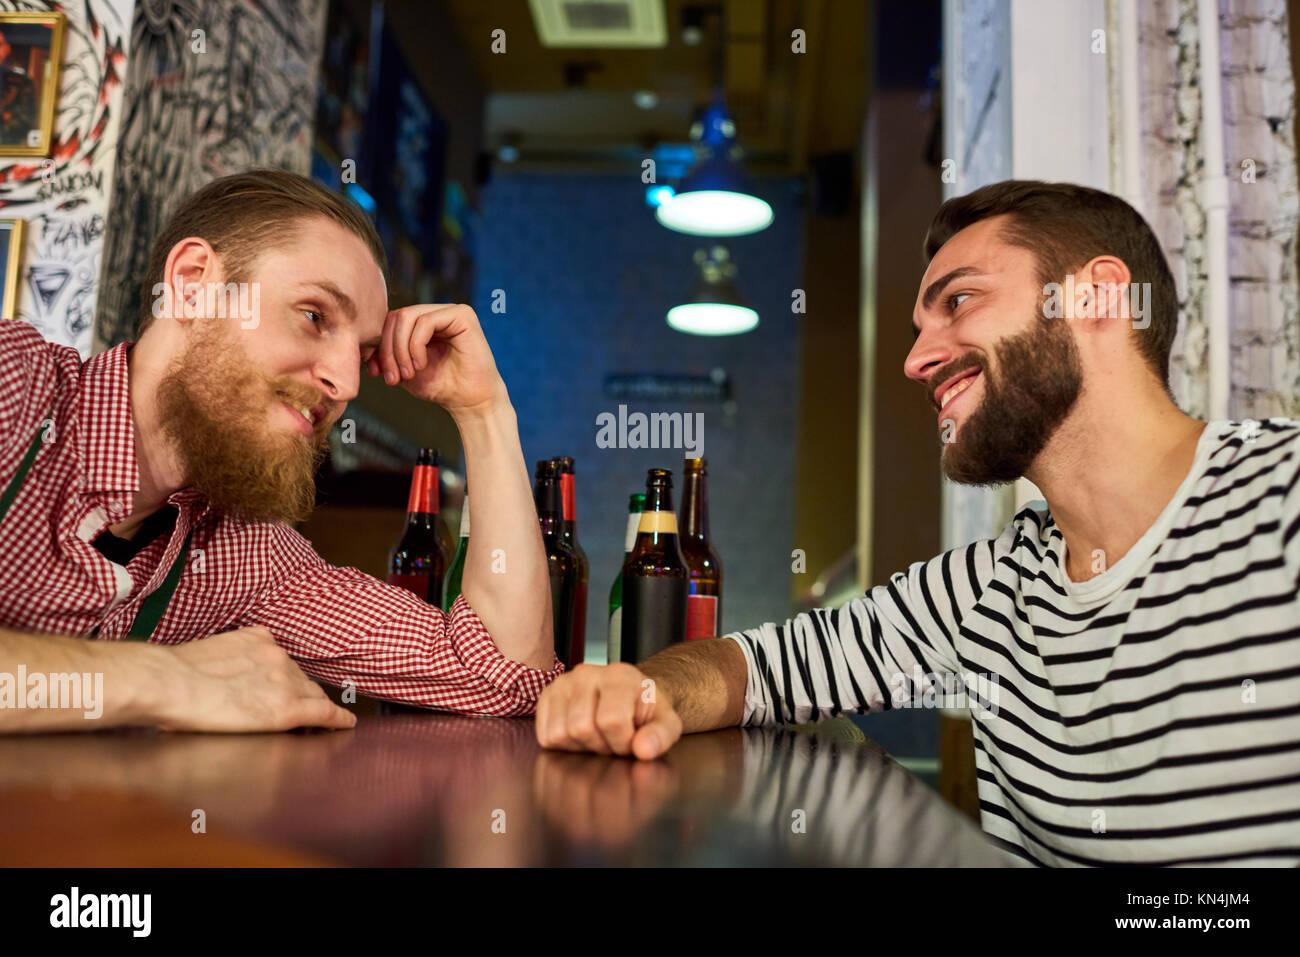 Two Drunk Buddies Talking in Bar - Stock Image